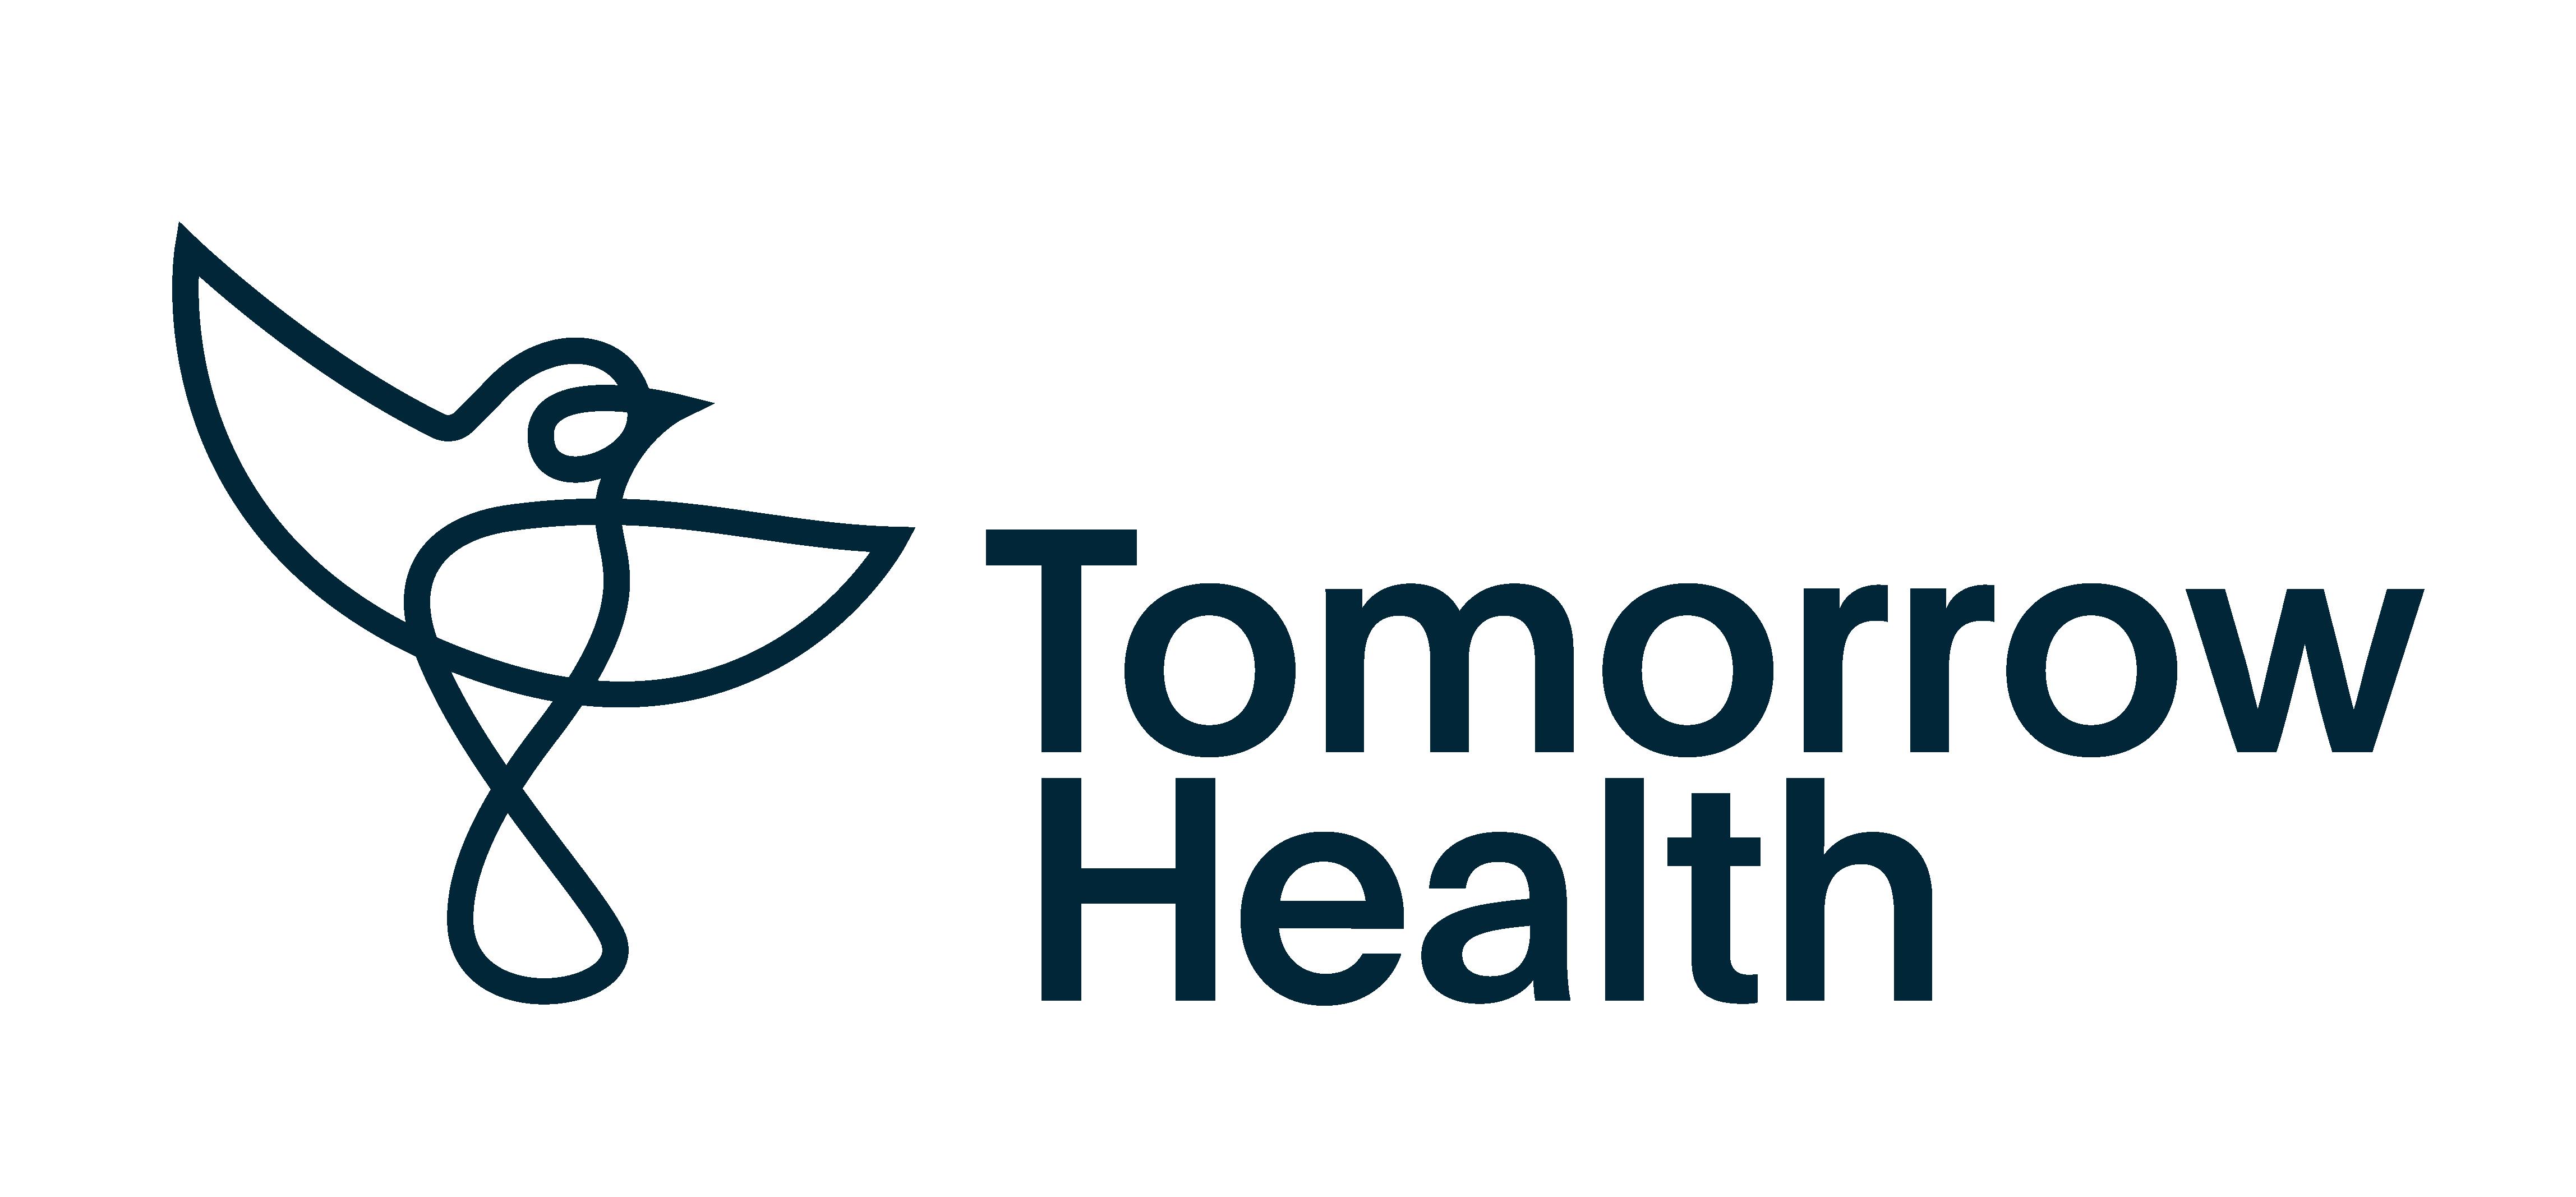 Tomorrow health logo